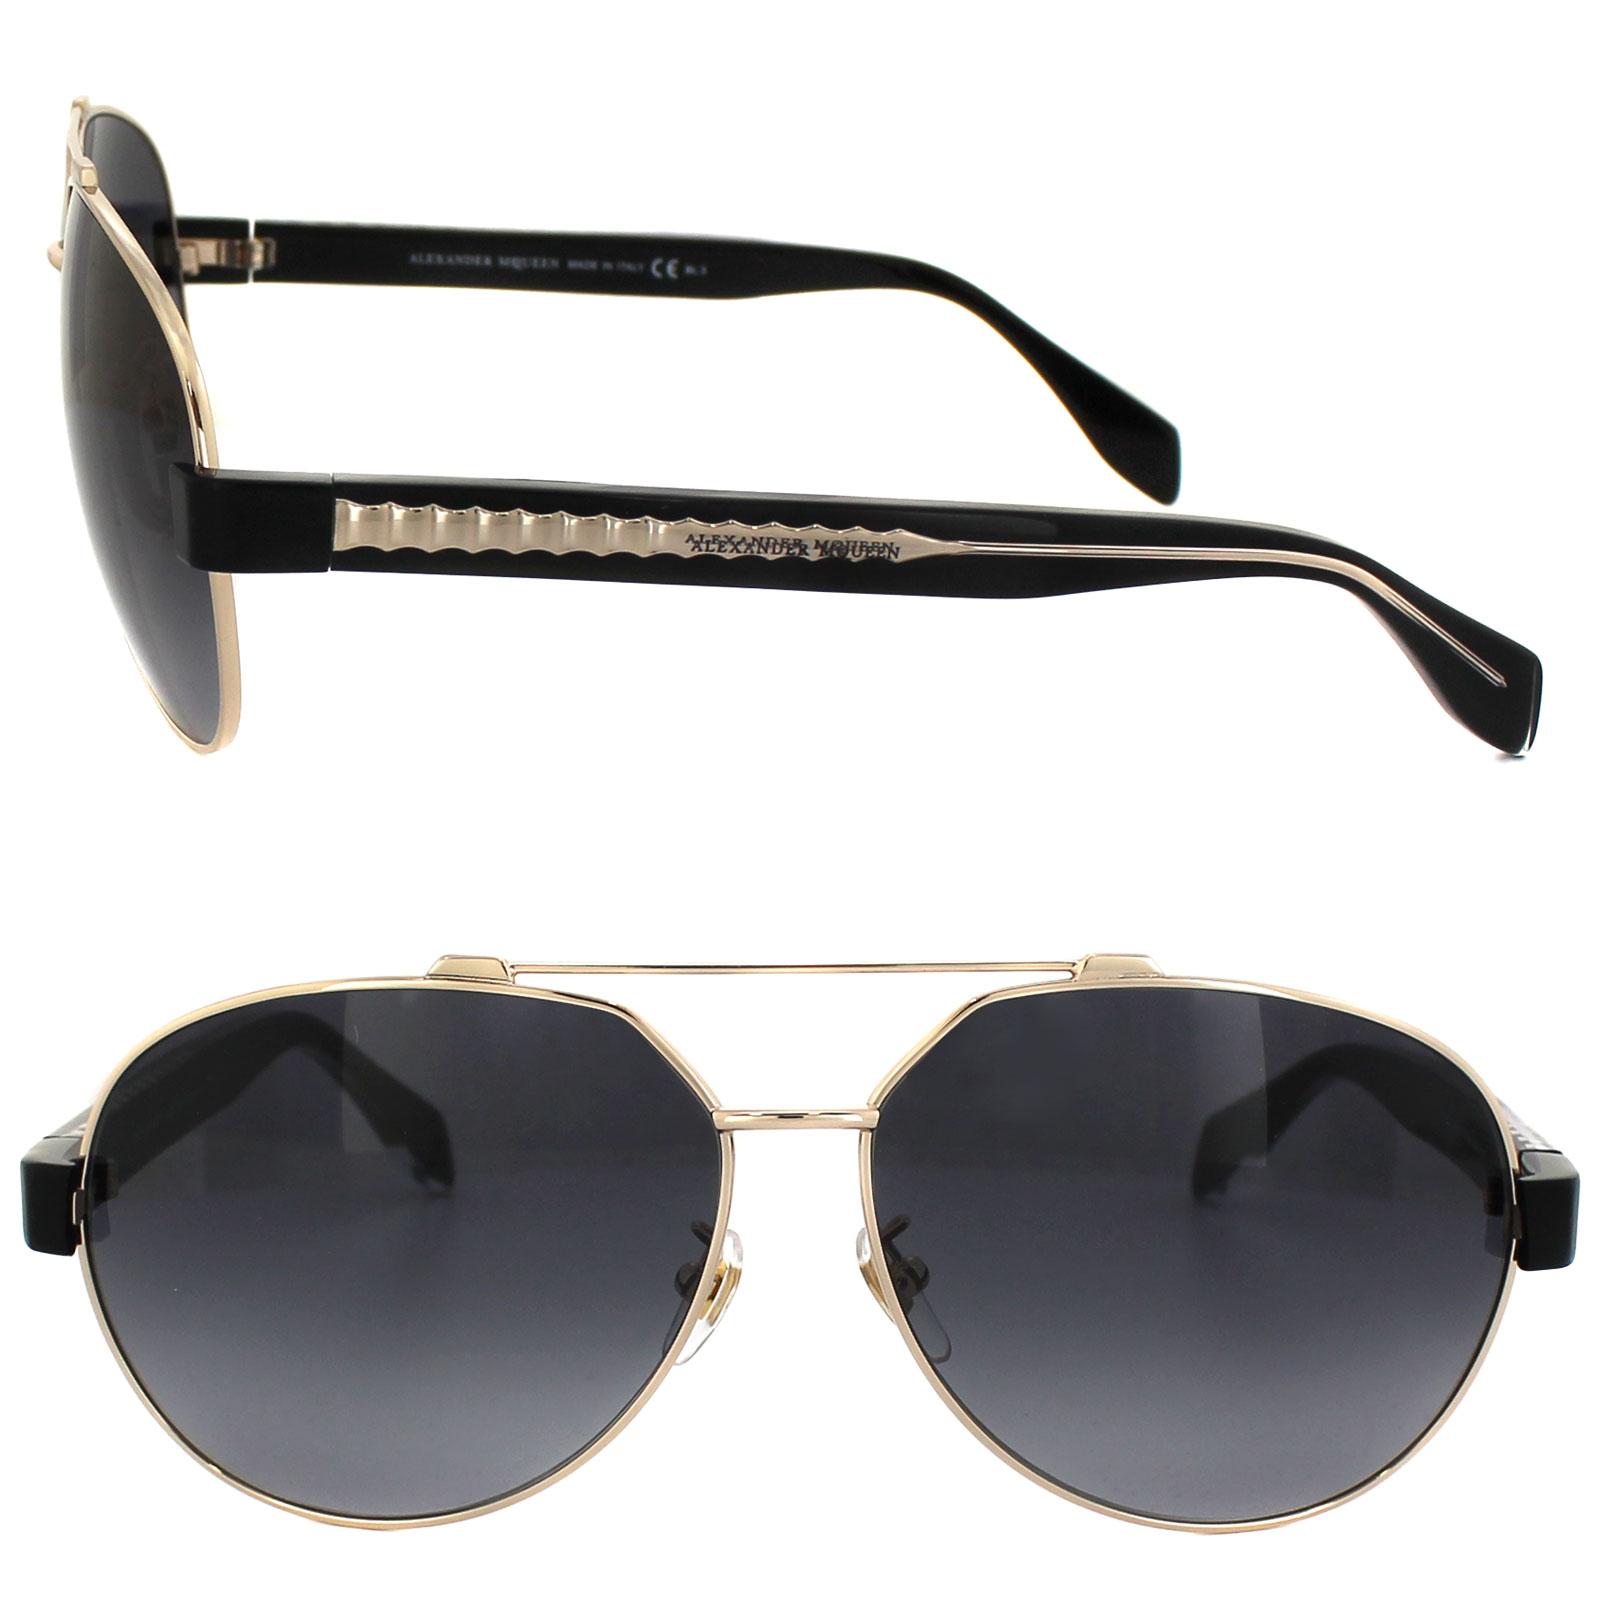 Mcqueen Sunglasses  alexander mcqueen sunglasses 4264 fs p6l hd gold black grey